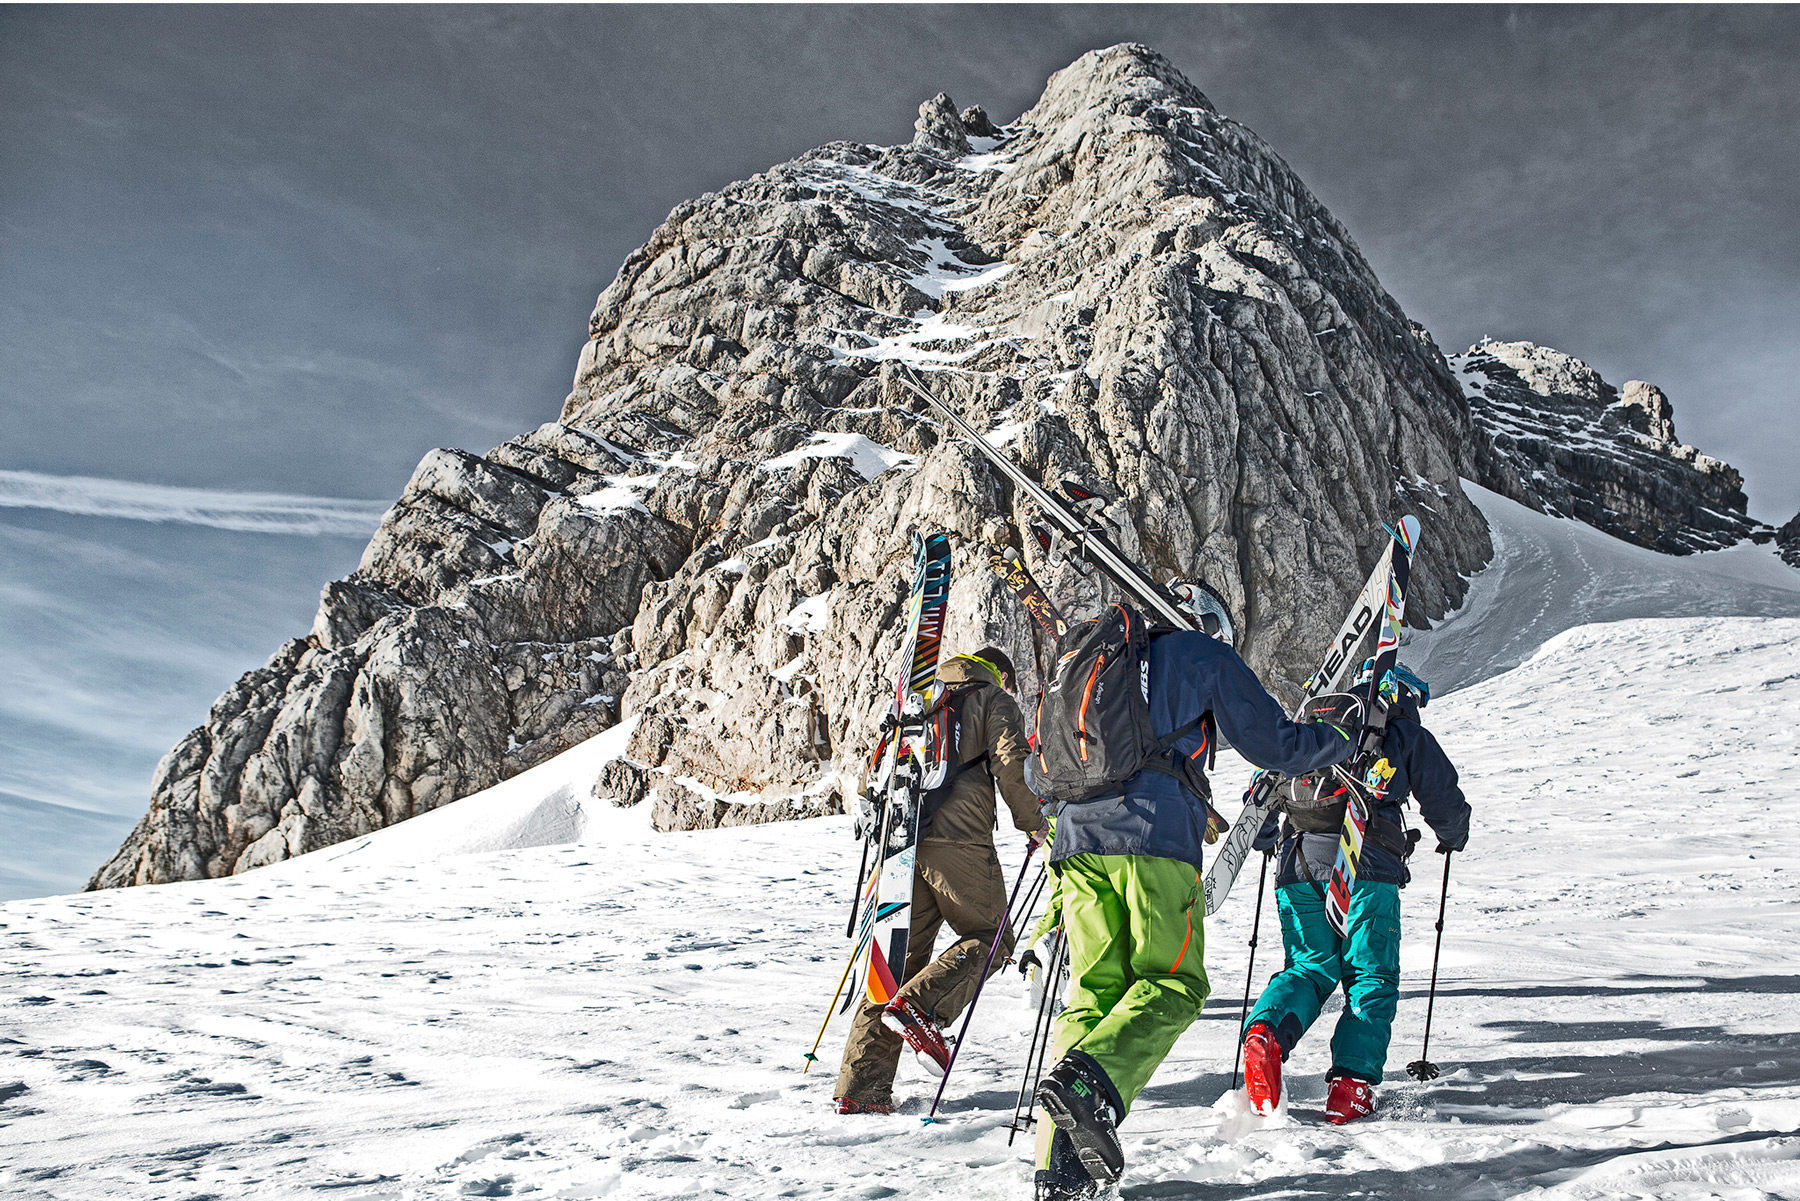 02-Pyua-Dachstein-Ski-Action-Christoph-Gramann